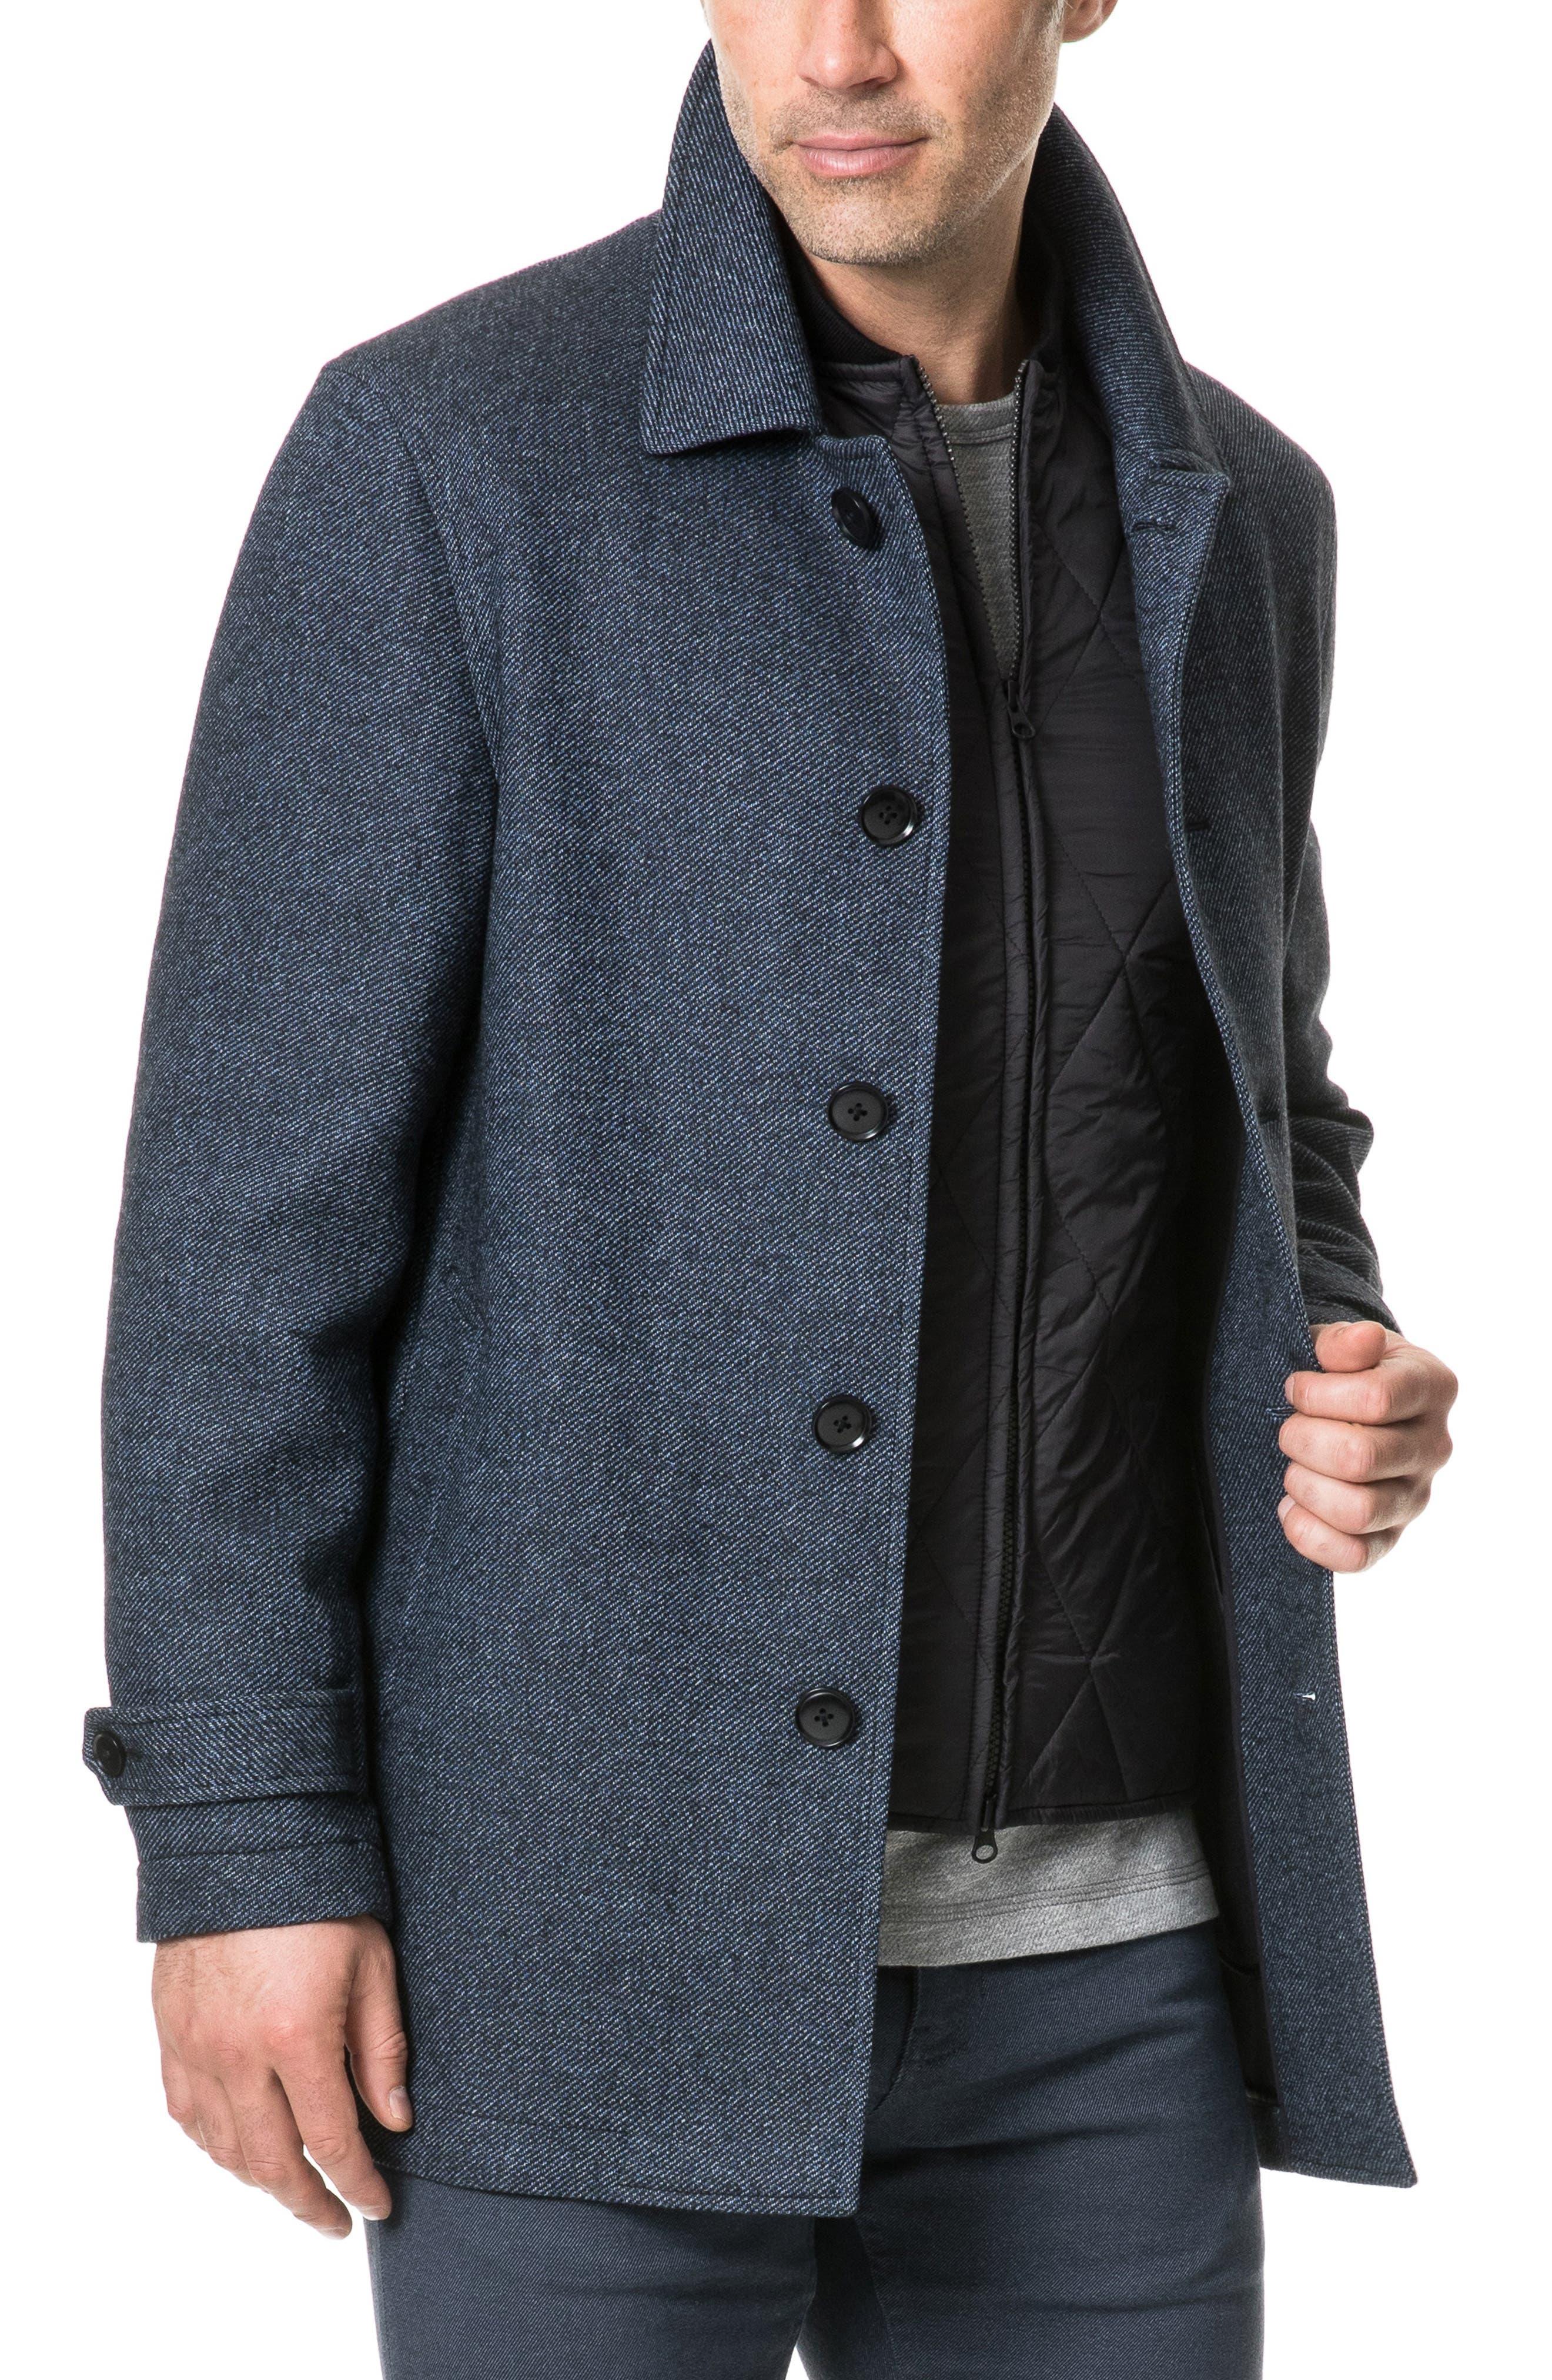 Balmoral Forest Regular Fit Coat,                             Alternate thumbnail 3, color,                             PEACOAT